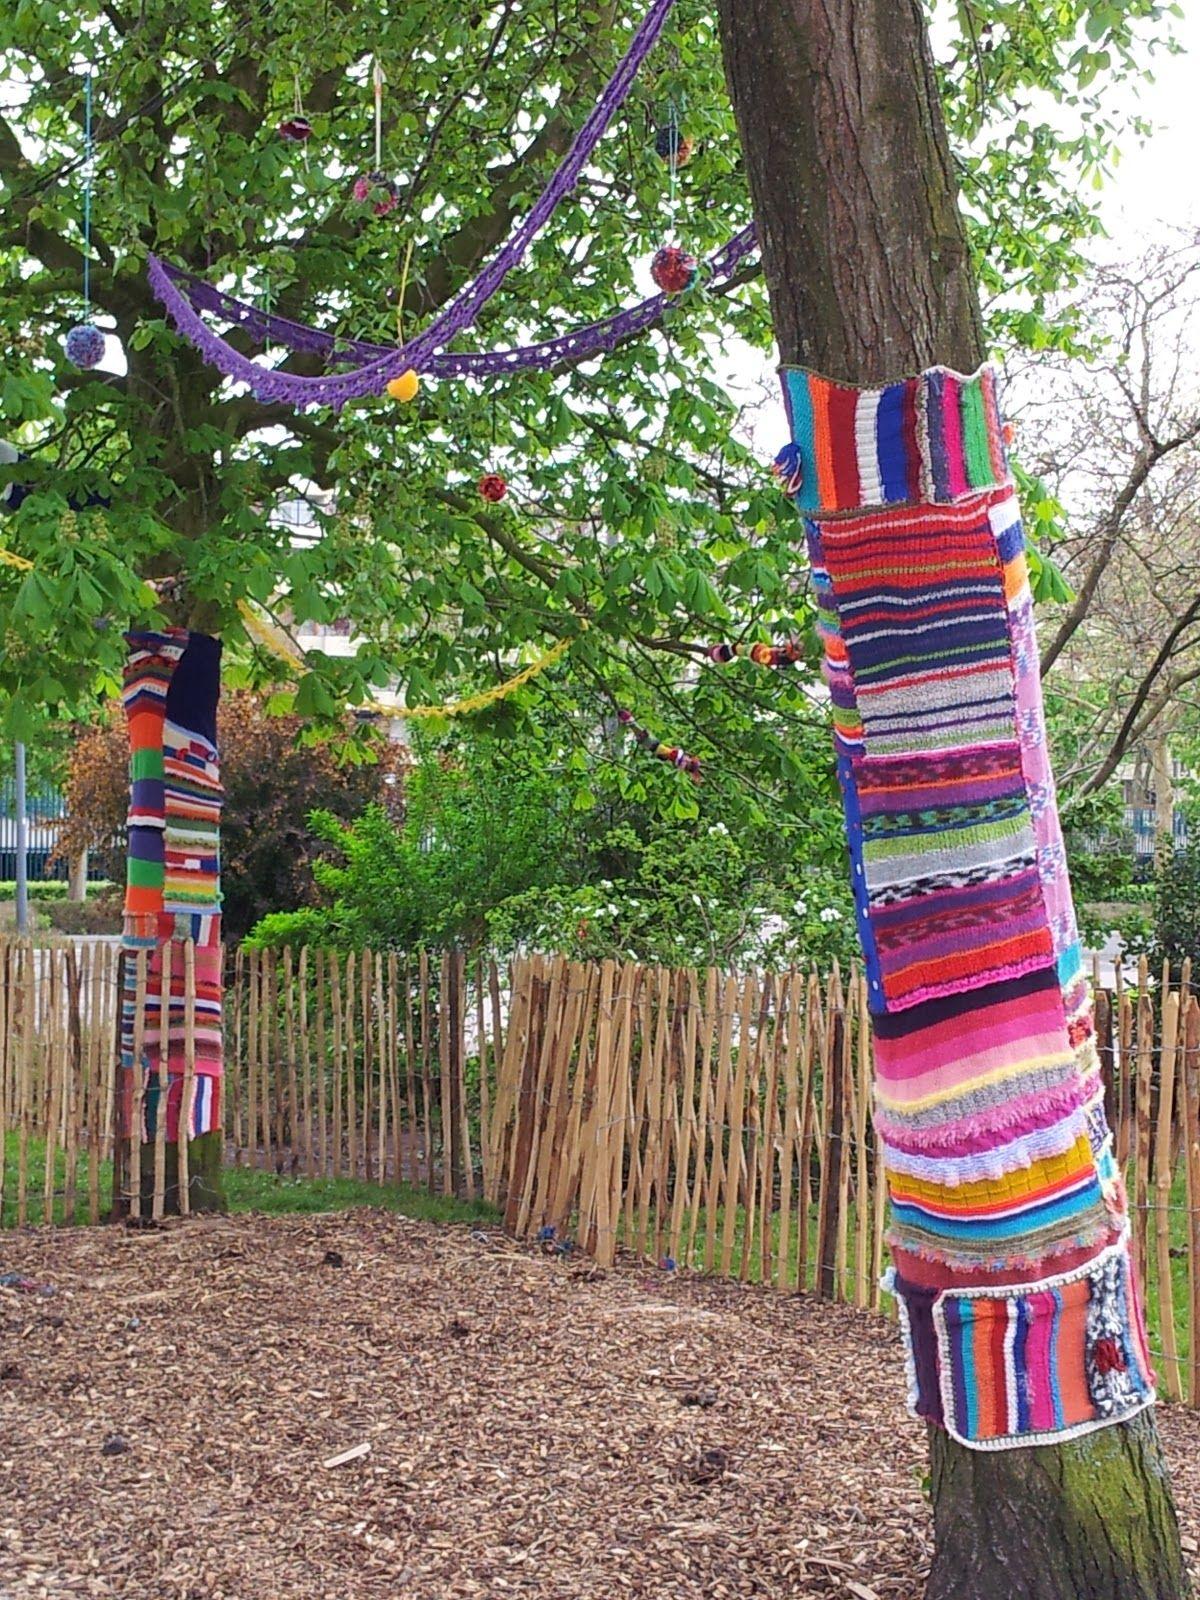 Urban Knitting Graffiti : Urban knitting art projects pinterest yarn